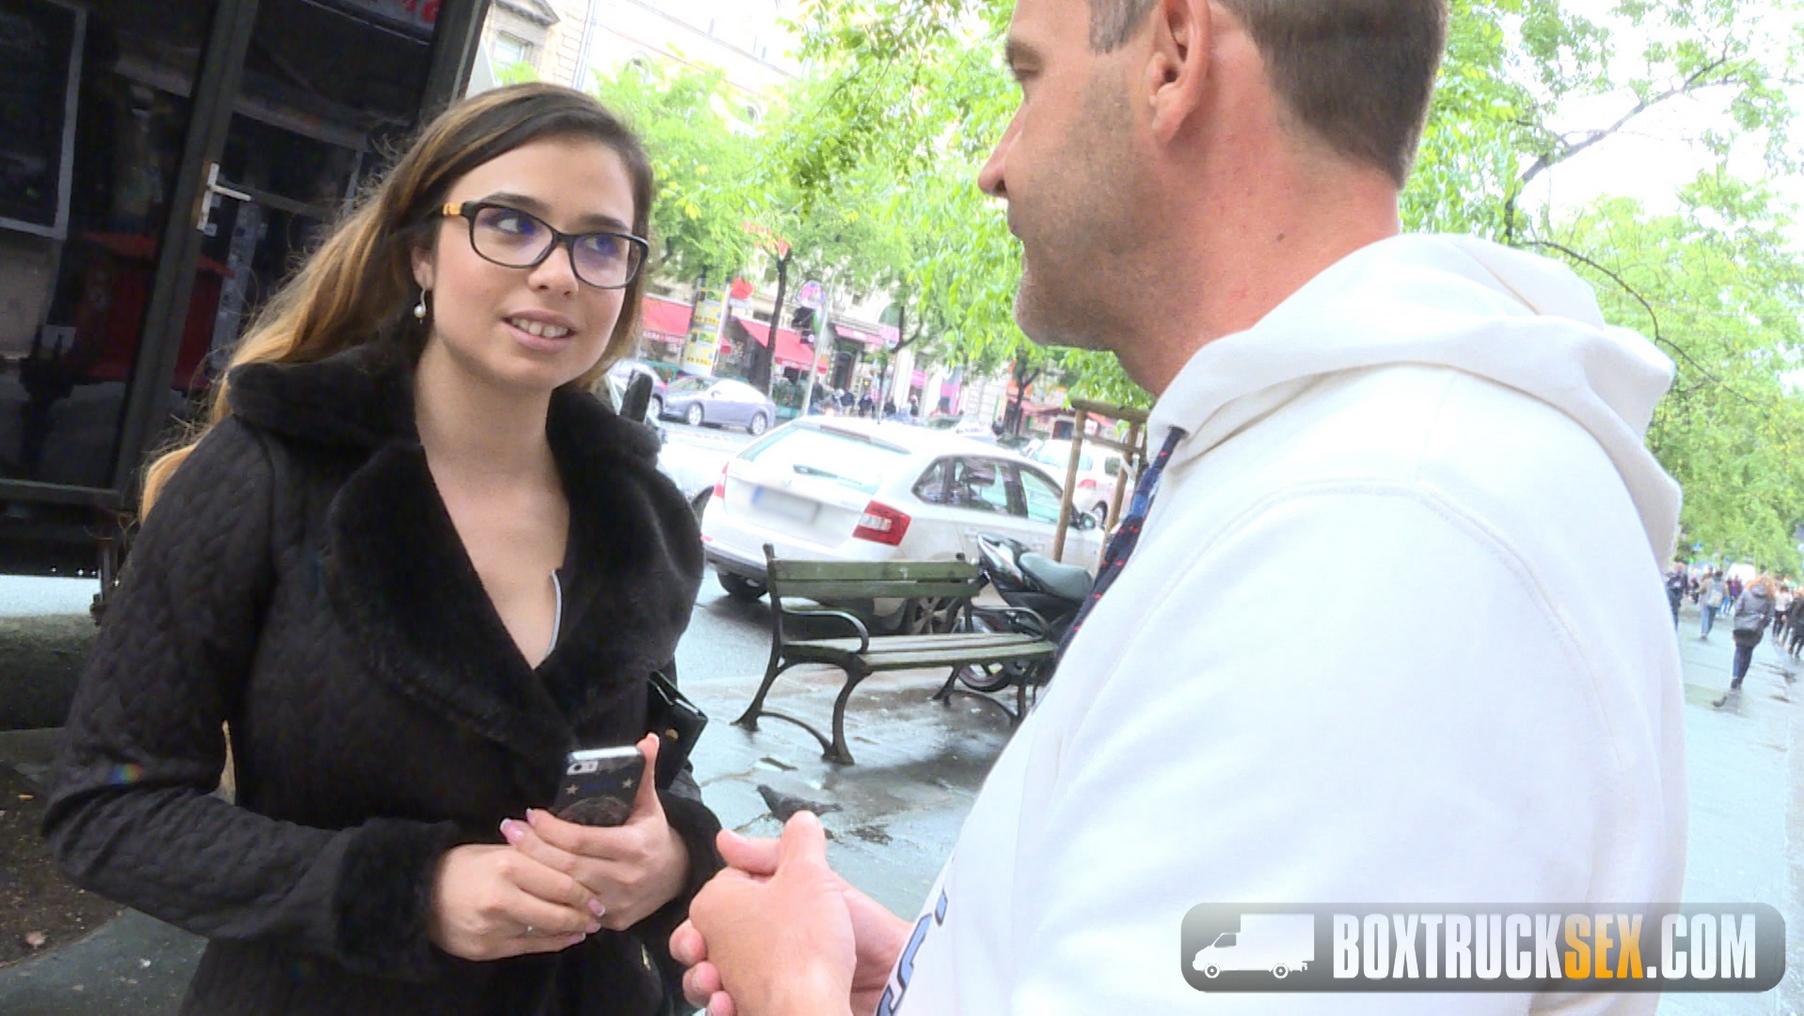 Mira Cuckold Agrees to her First Public Porn Shoot  - Sep 10, 2016 - Box Truck Sex